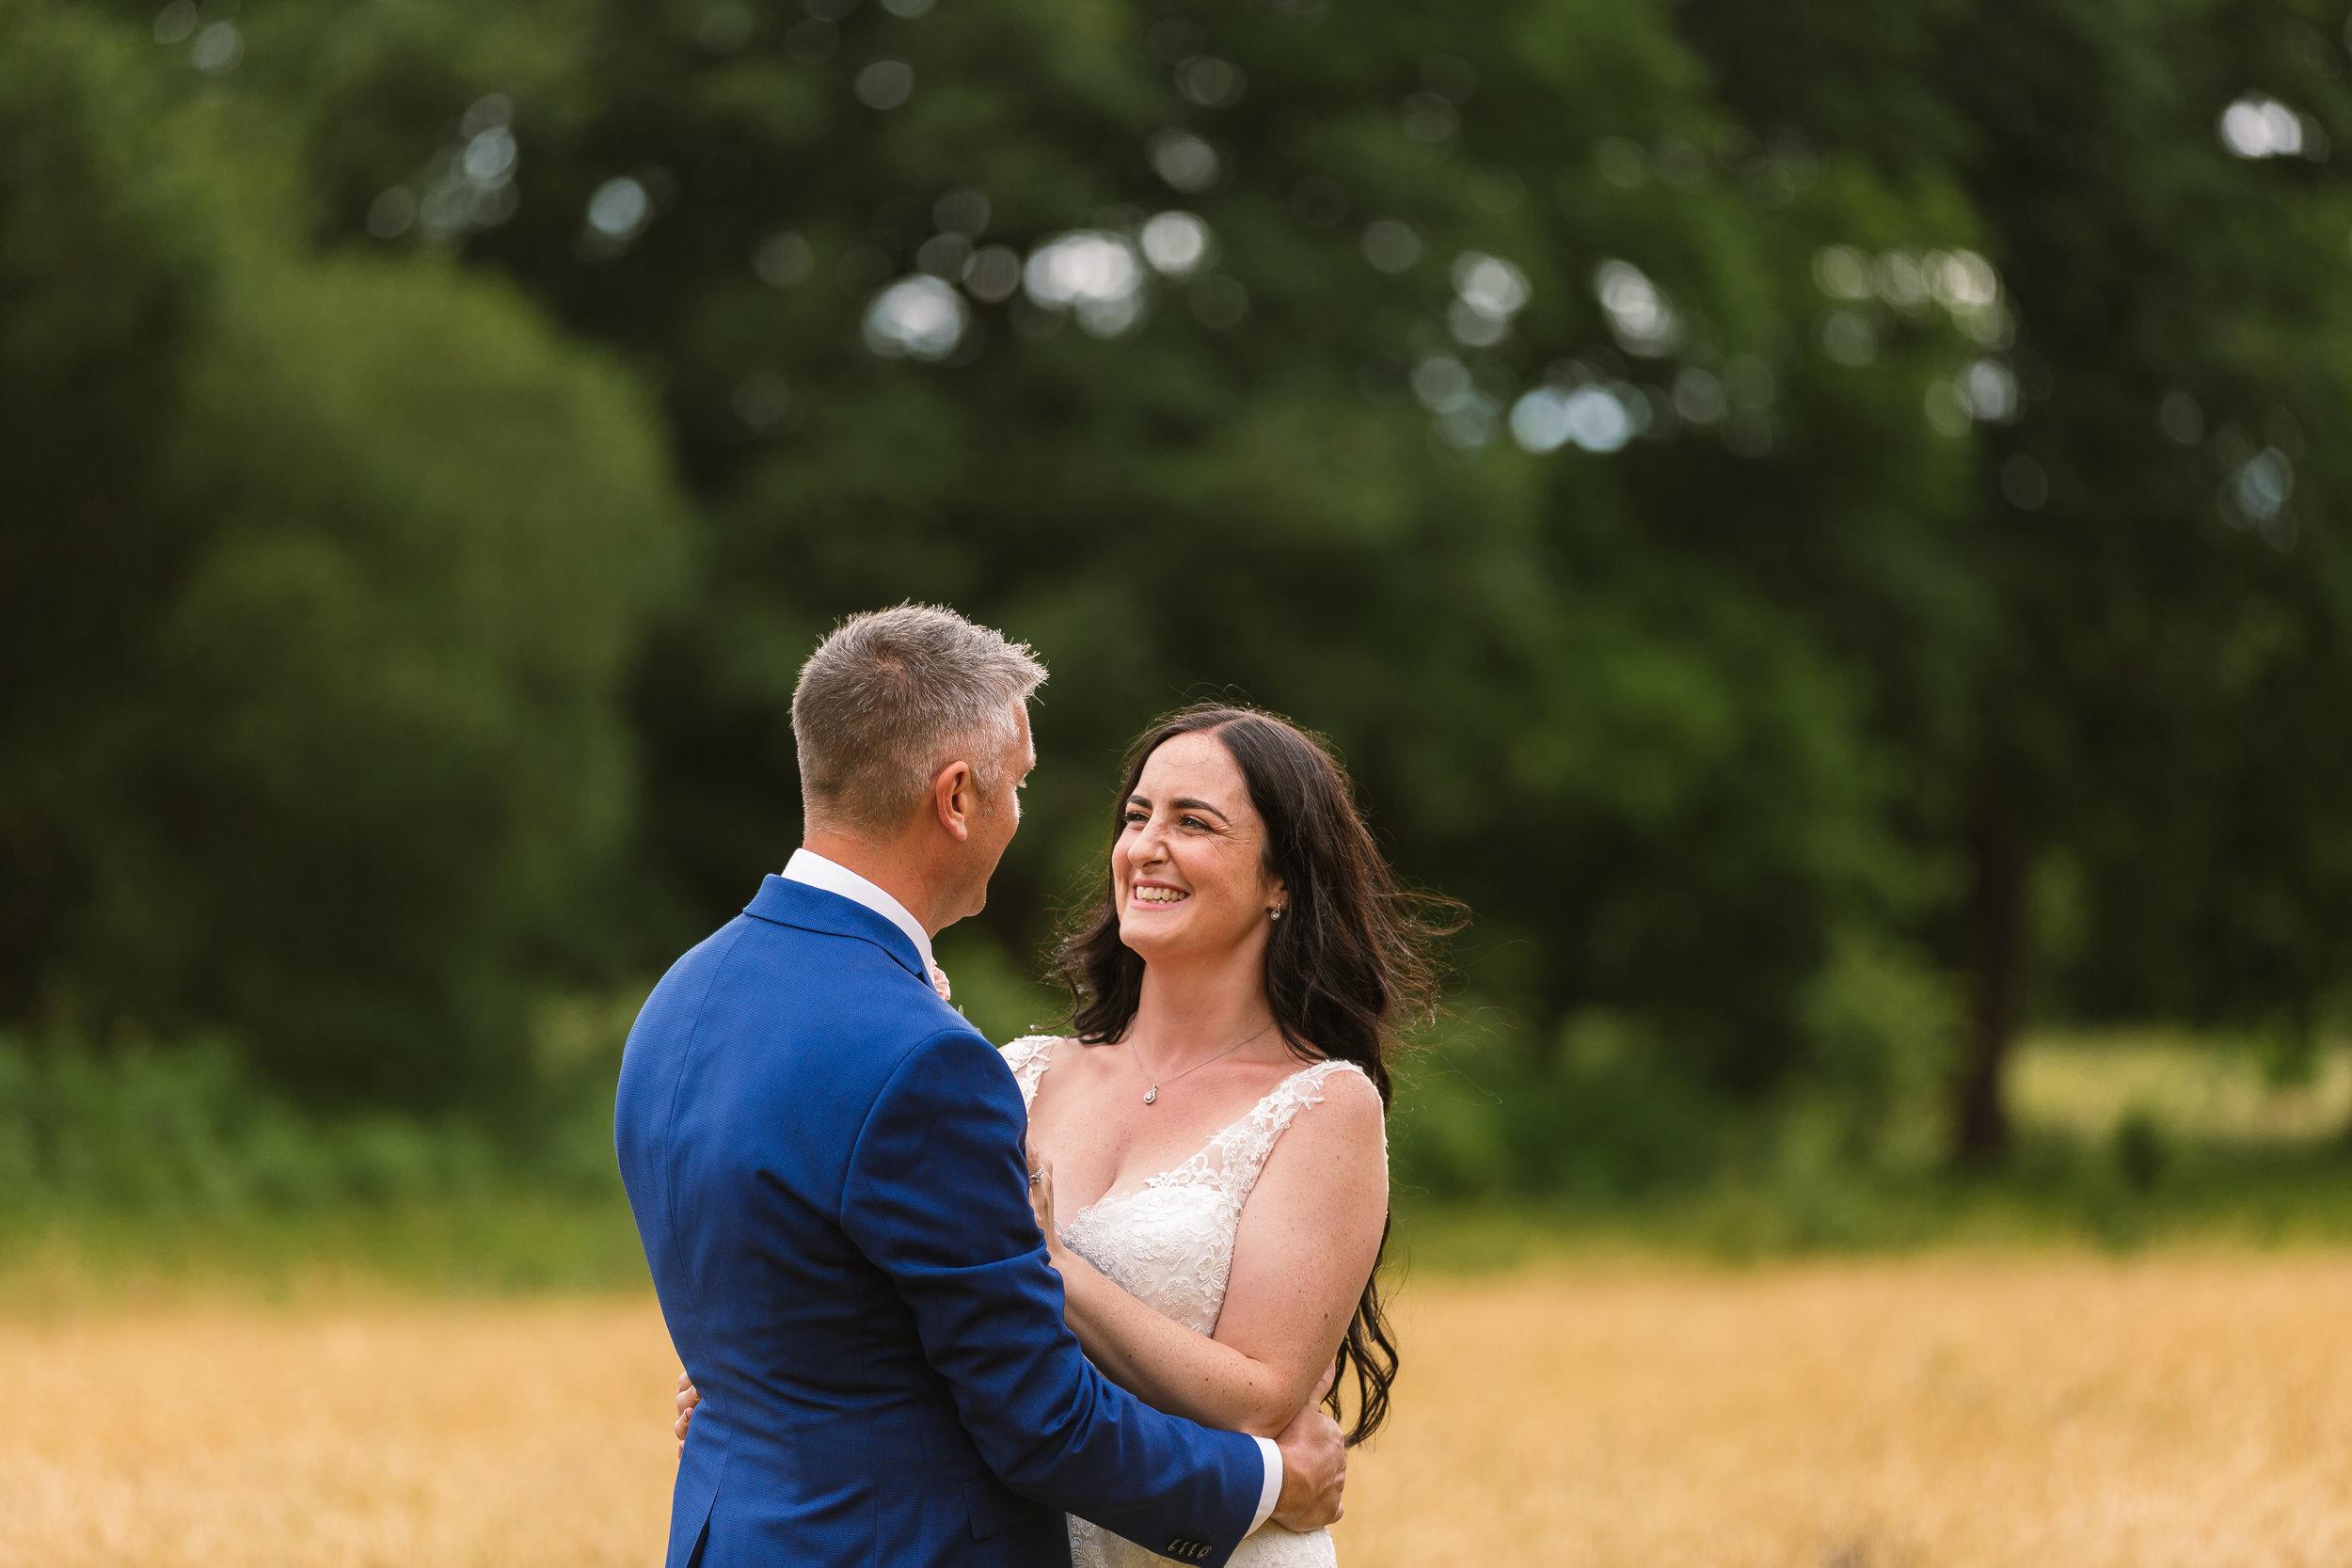 Sarah-Fishlock-Photography : Hampshire-wedding-photographer-hampshire : fleet-wedding-photographer-fleet : Meade-Hall-Wedding-Photographer : Meade-Hall-Wedding-Photos-761.jpg